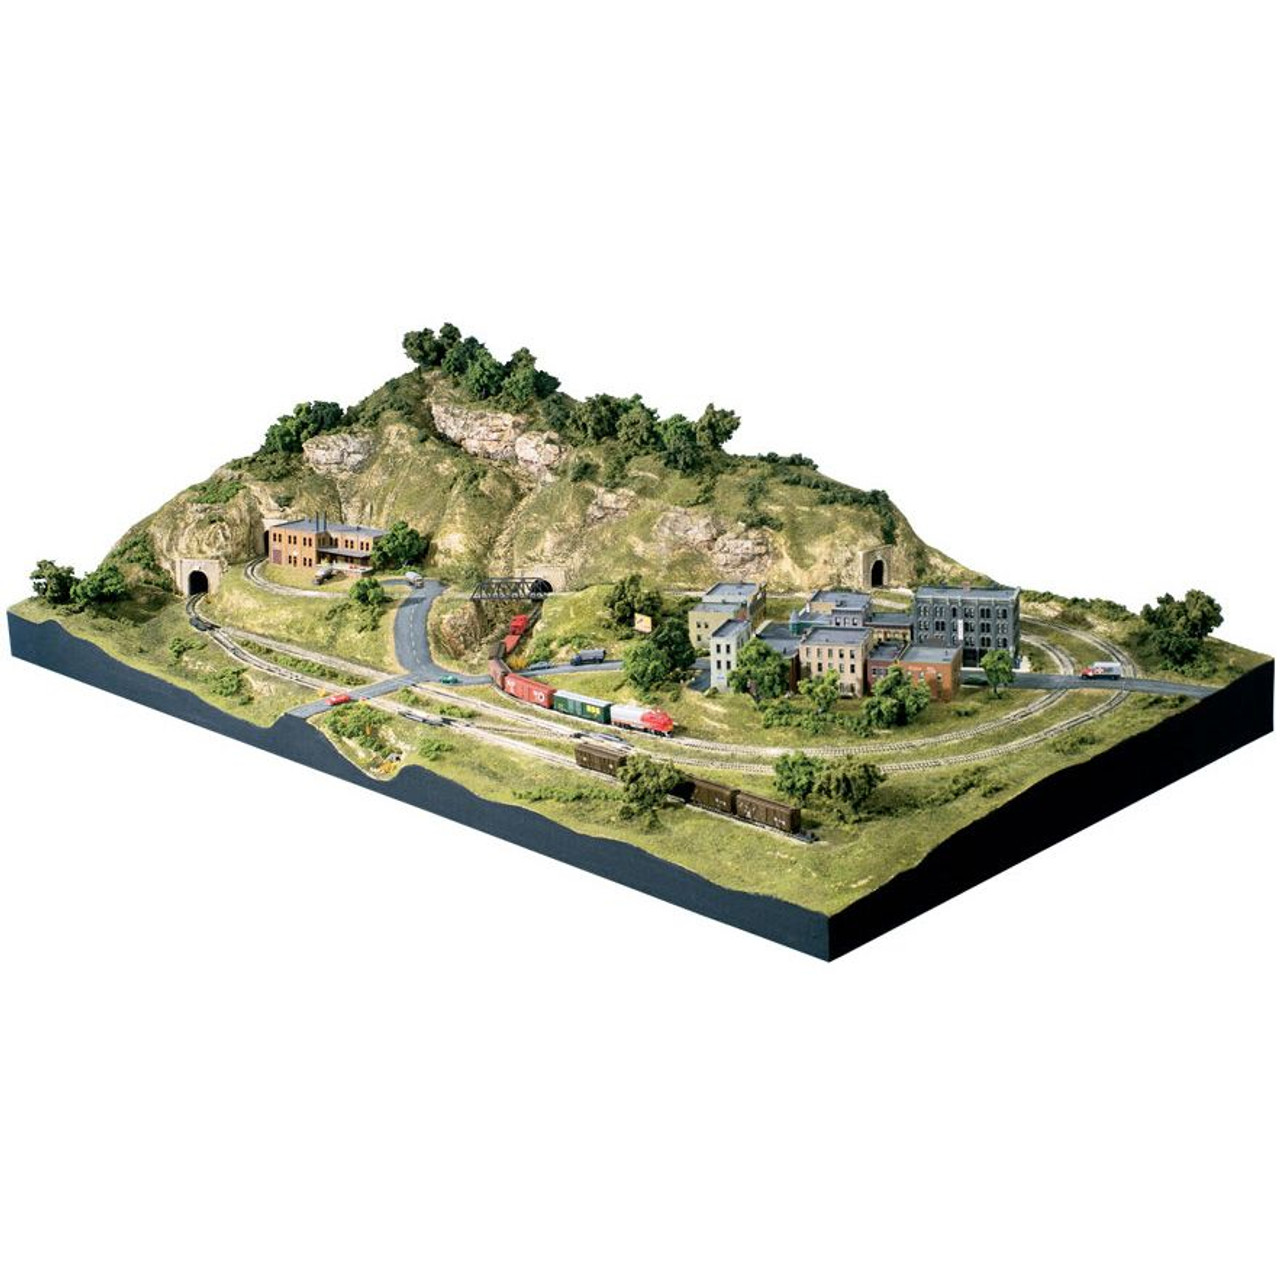 Woodland Scenics ST1482 - N Scenic Ridge Layout Kit